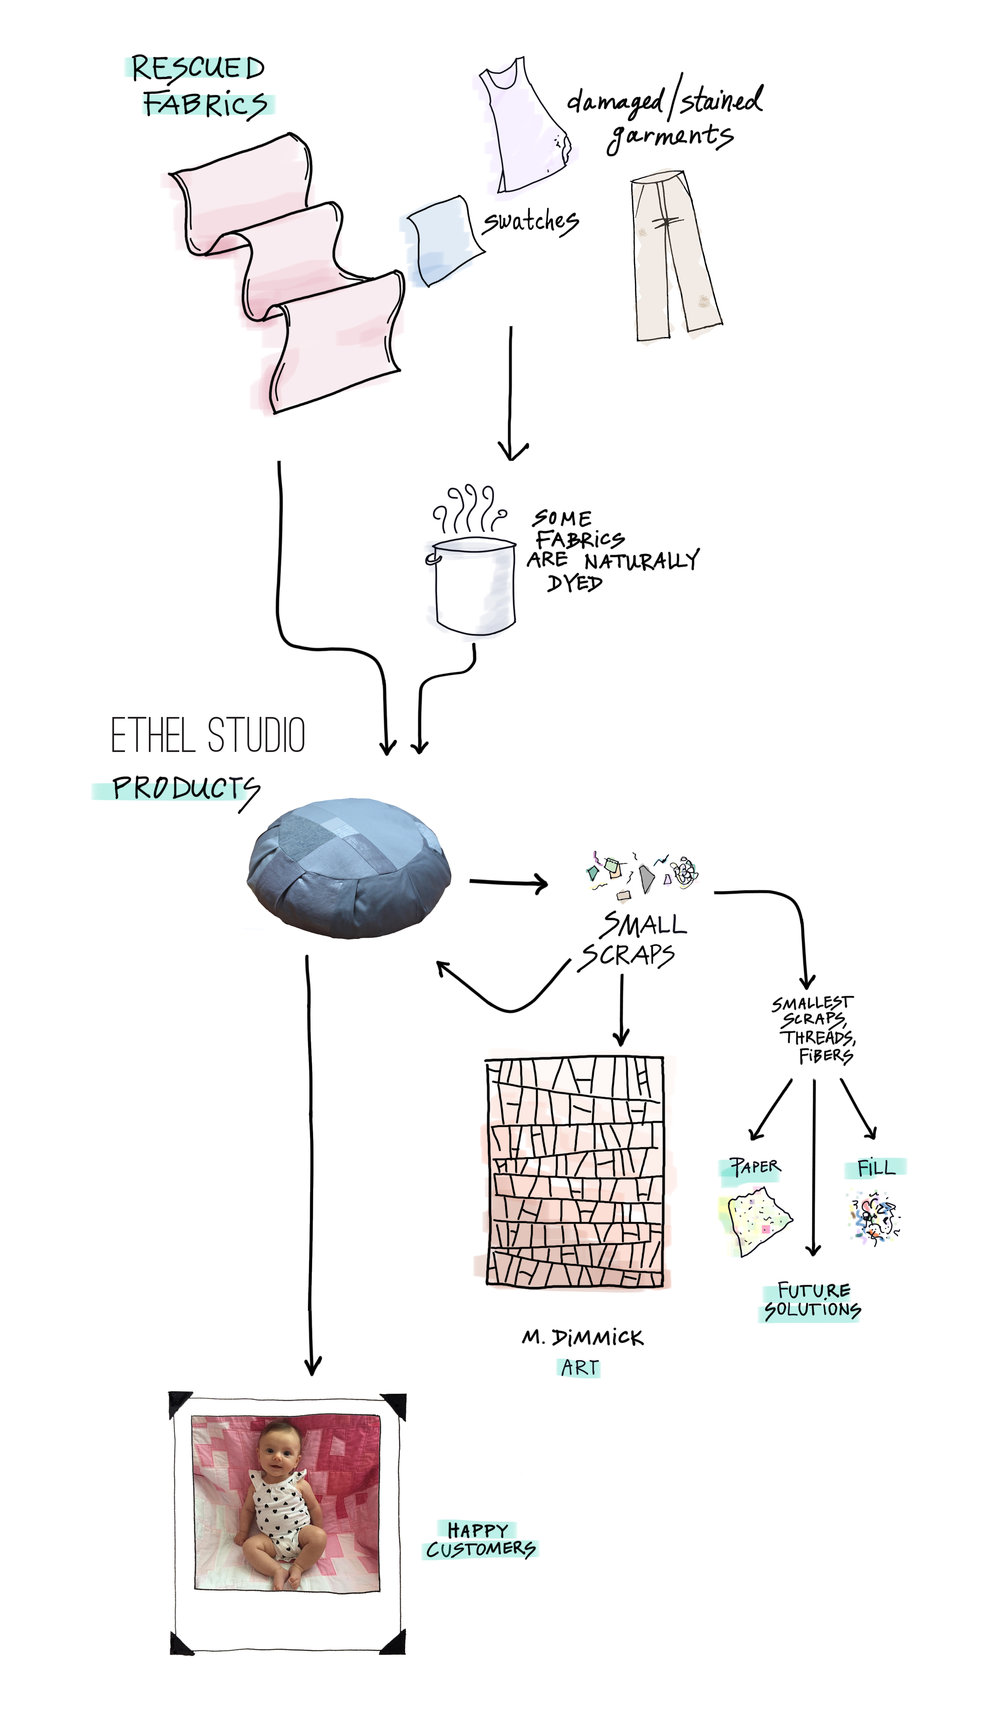 EthelStudio-Process-rescued-fabrics.jpg